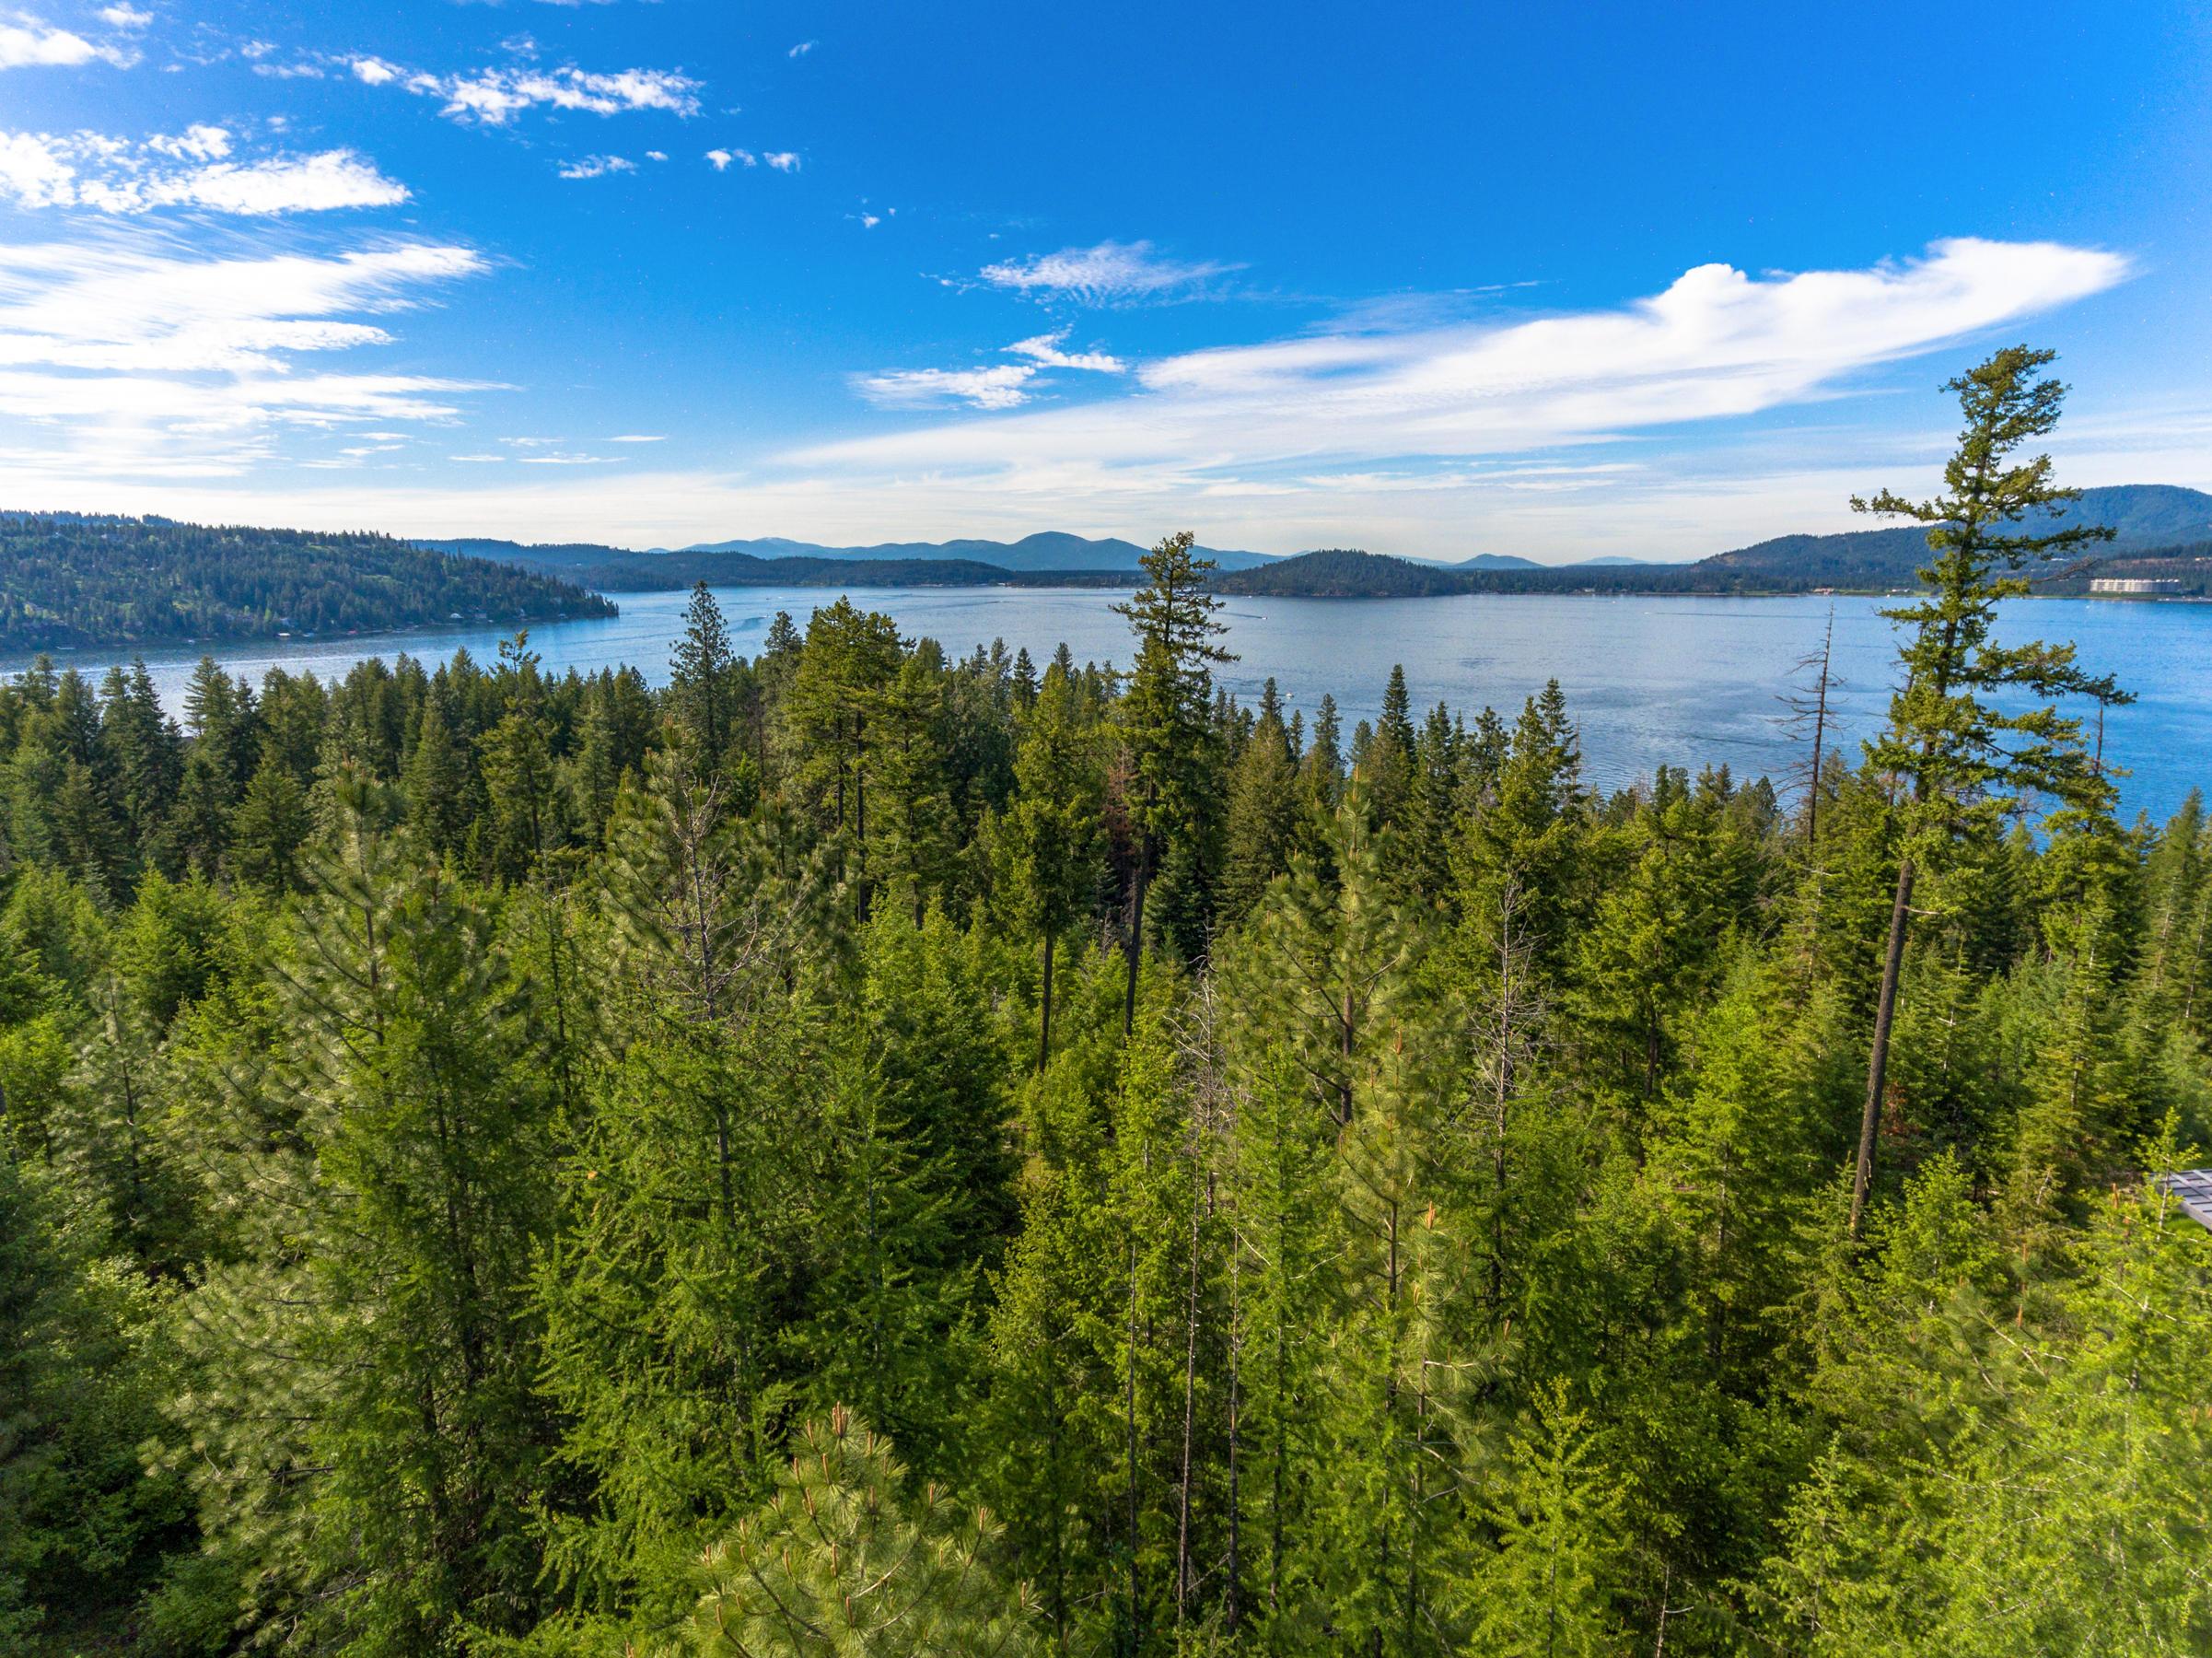 photo of   5215 S Jackleg Trail  Harrison Idaho 83833